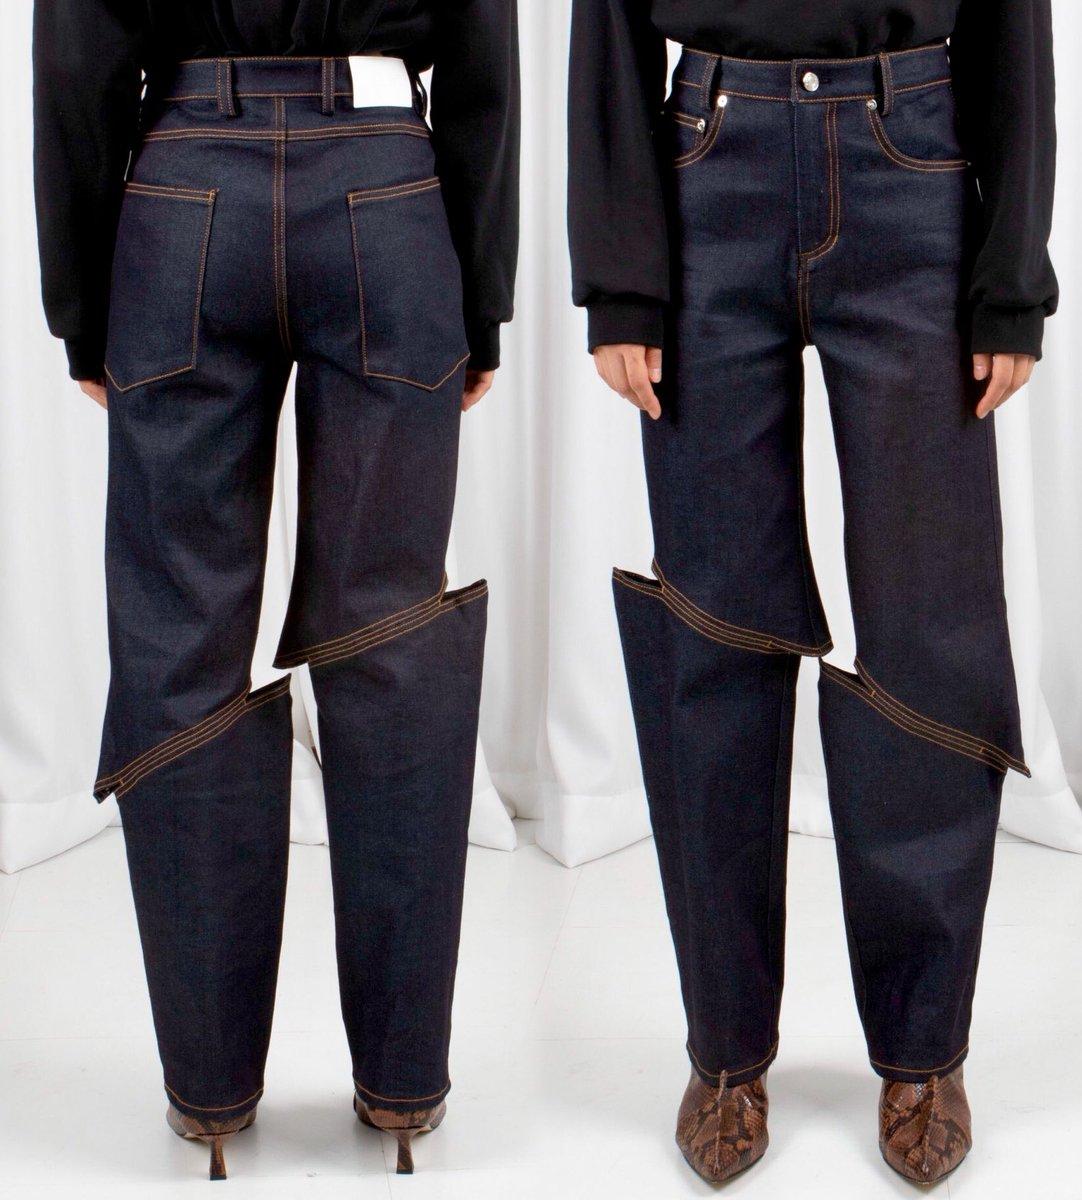 Jeans by LEJE https://t.co/hhqpV0kvMi